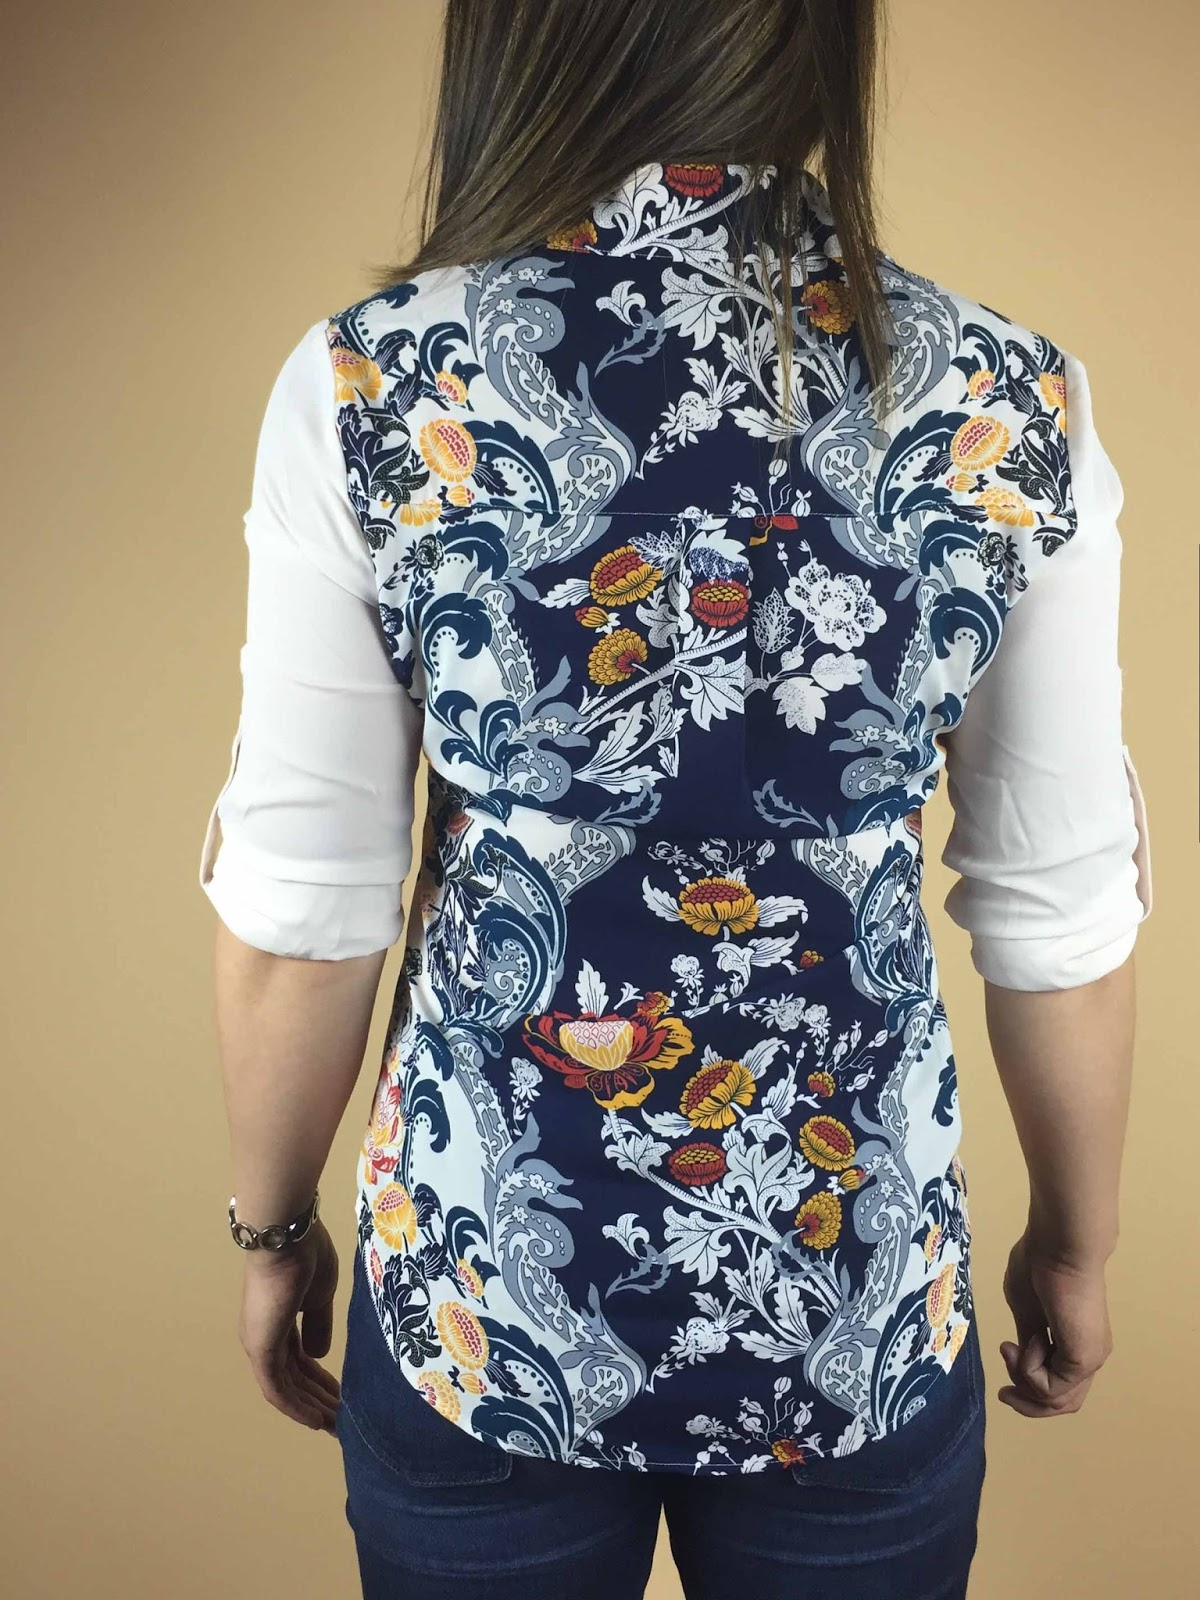 0a498e17c9fe3 Express Slim Fit Shirts